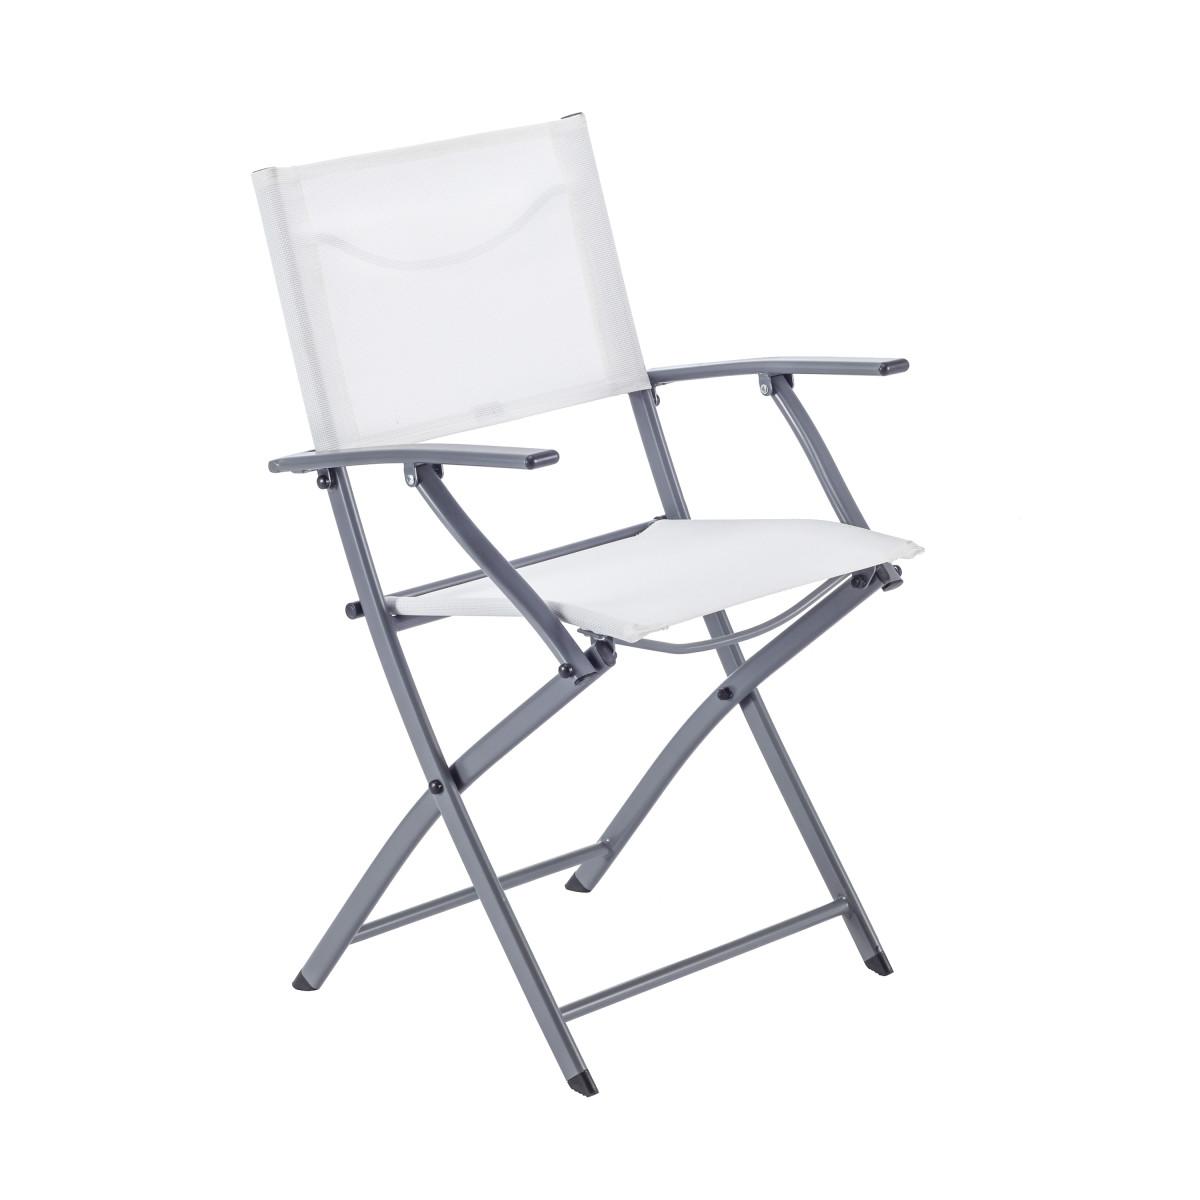 Кресло Naterial Emys Origami Складное 54Х52Х83 Сталь Белый